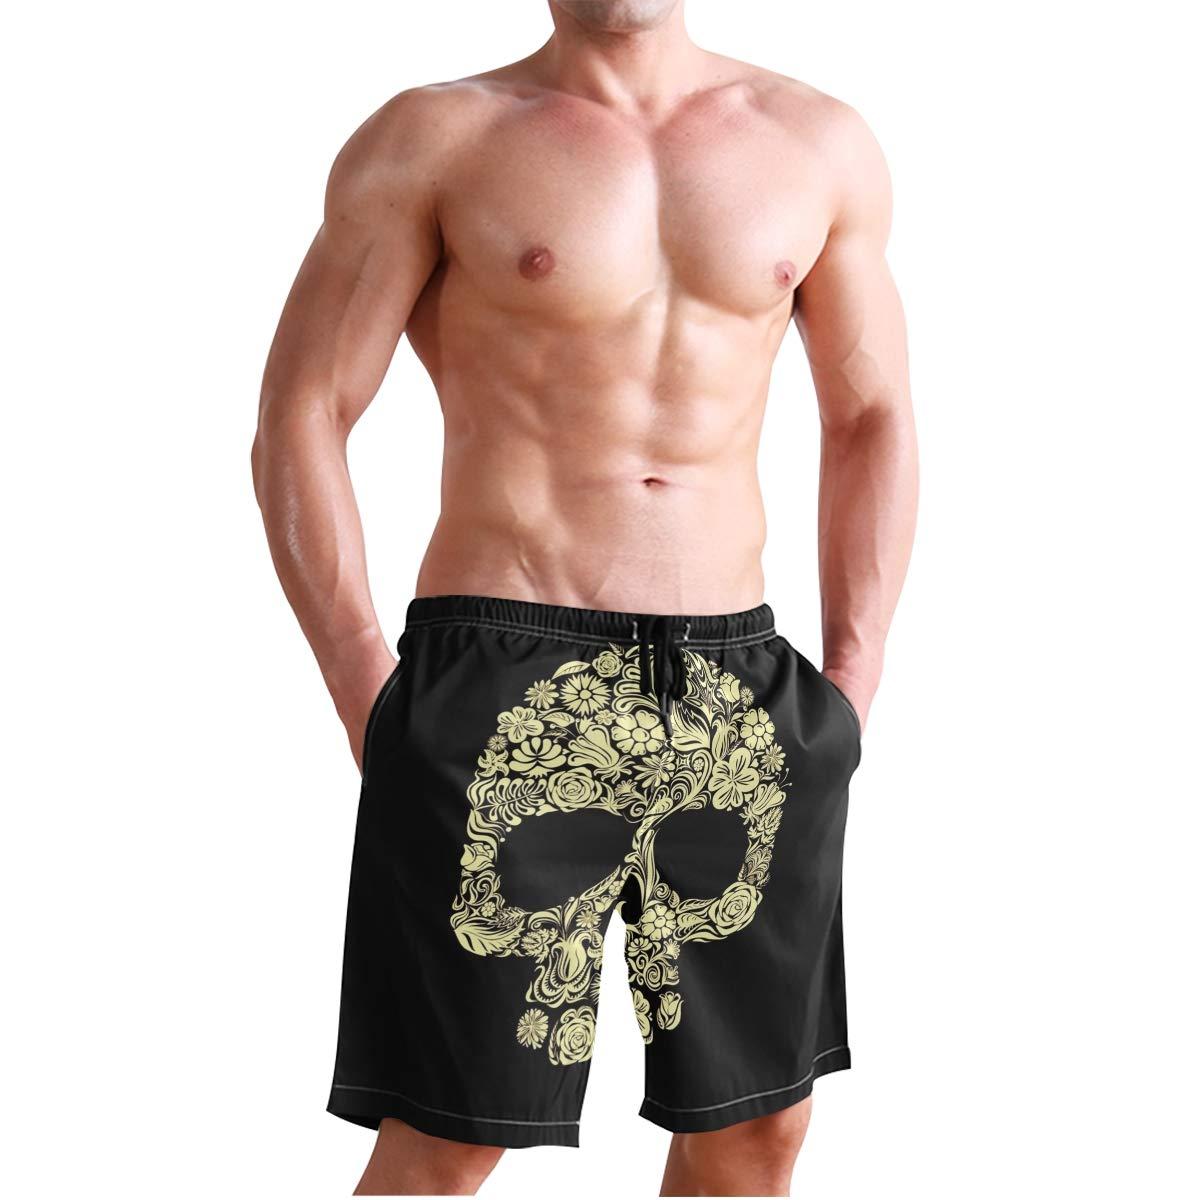 Men/'s Swim Trunks Beach Board Swimwear Shorts Dark Skull Swimming Short Pants Quick Dry Water Shorts Mesh Lining